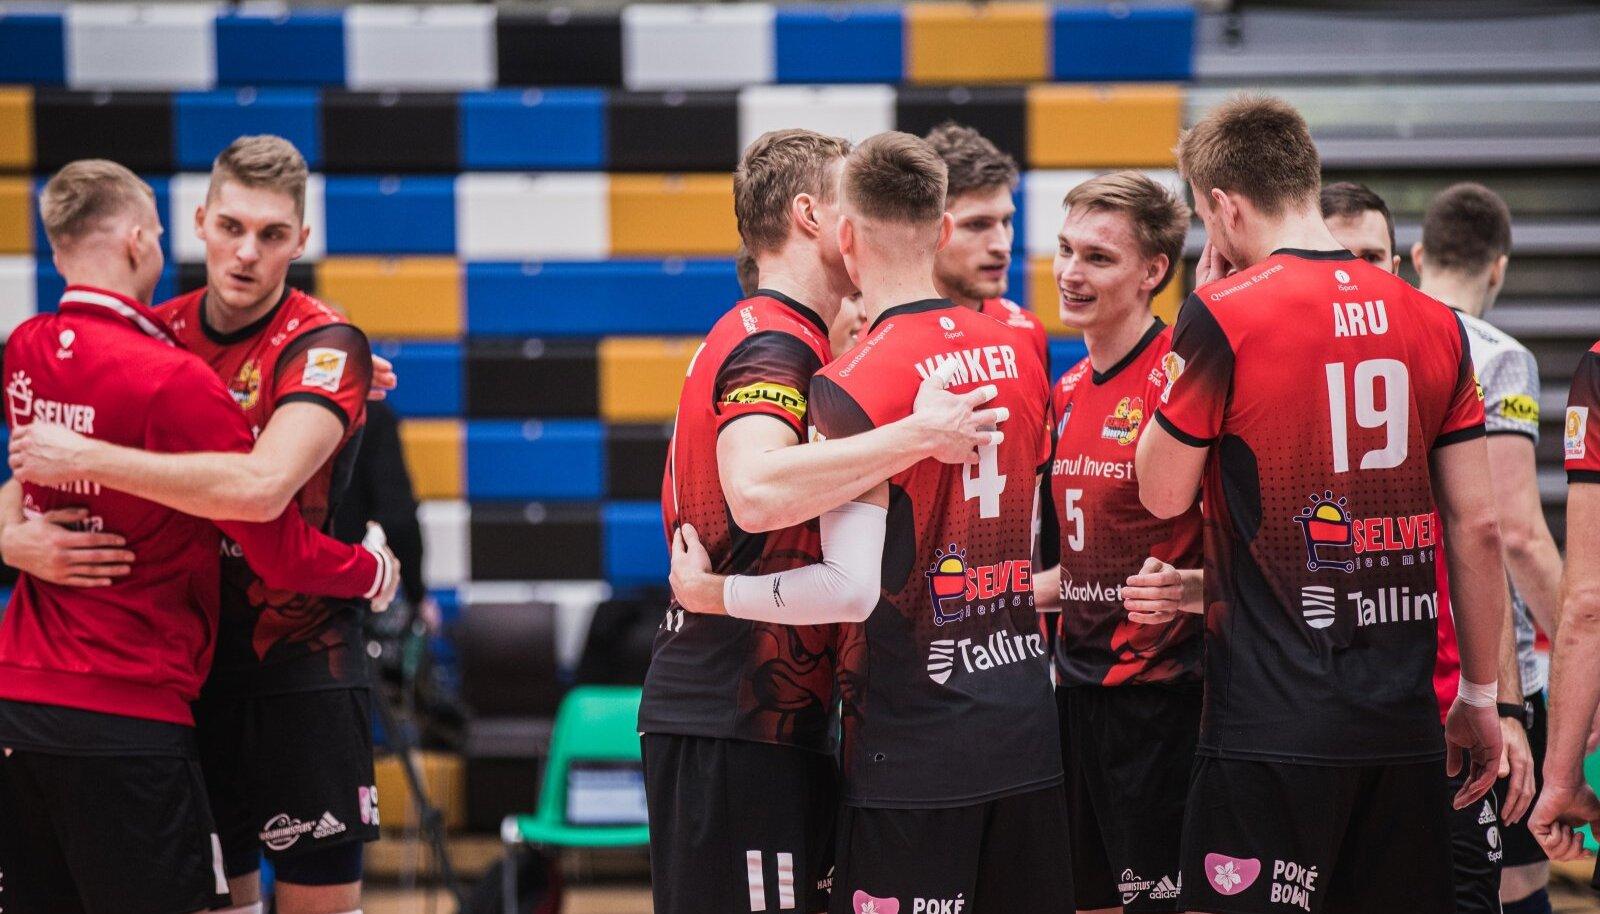 Bigbank Tartu vs Selver Tallinn